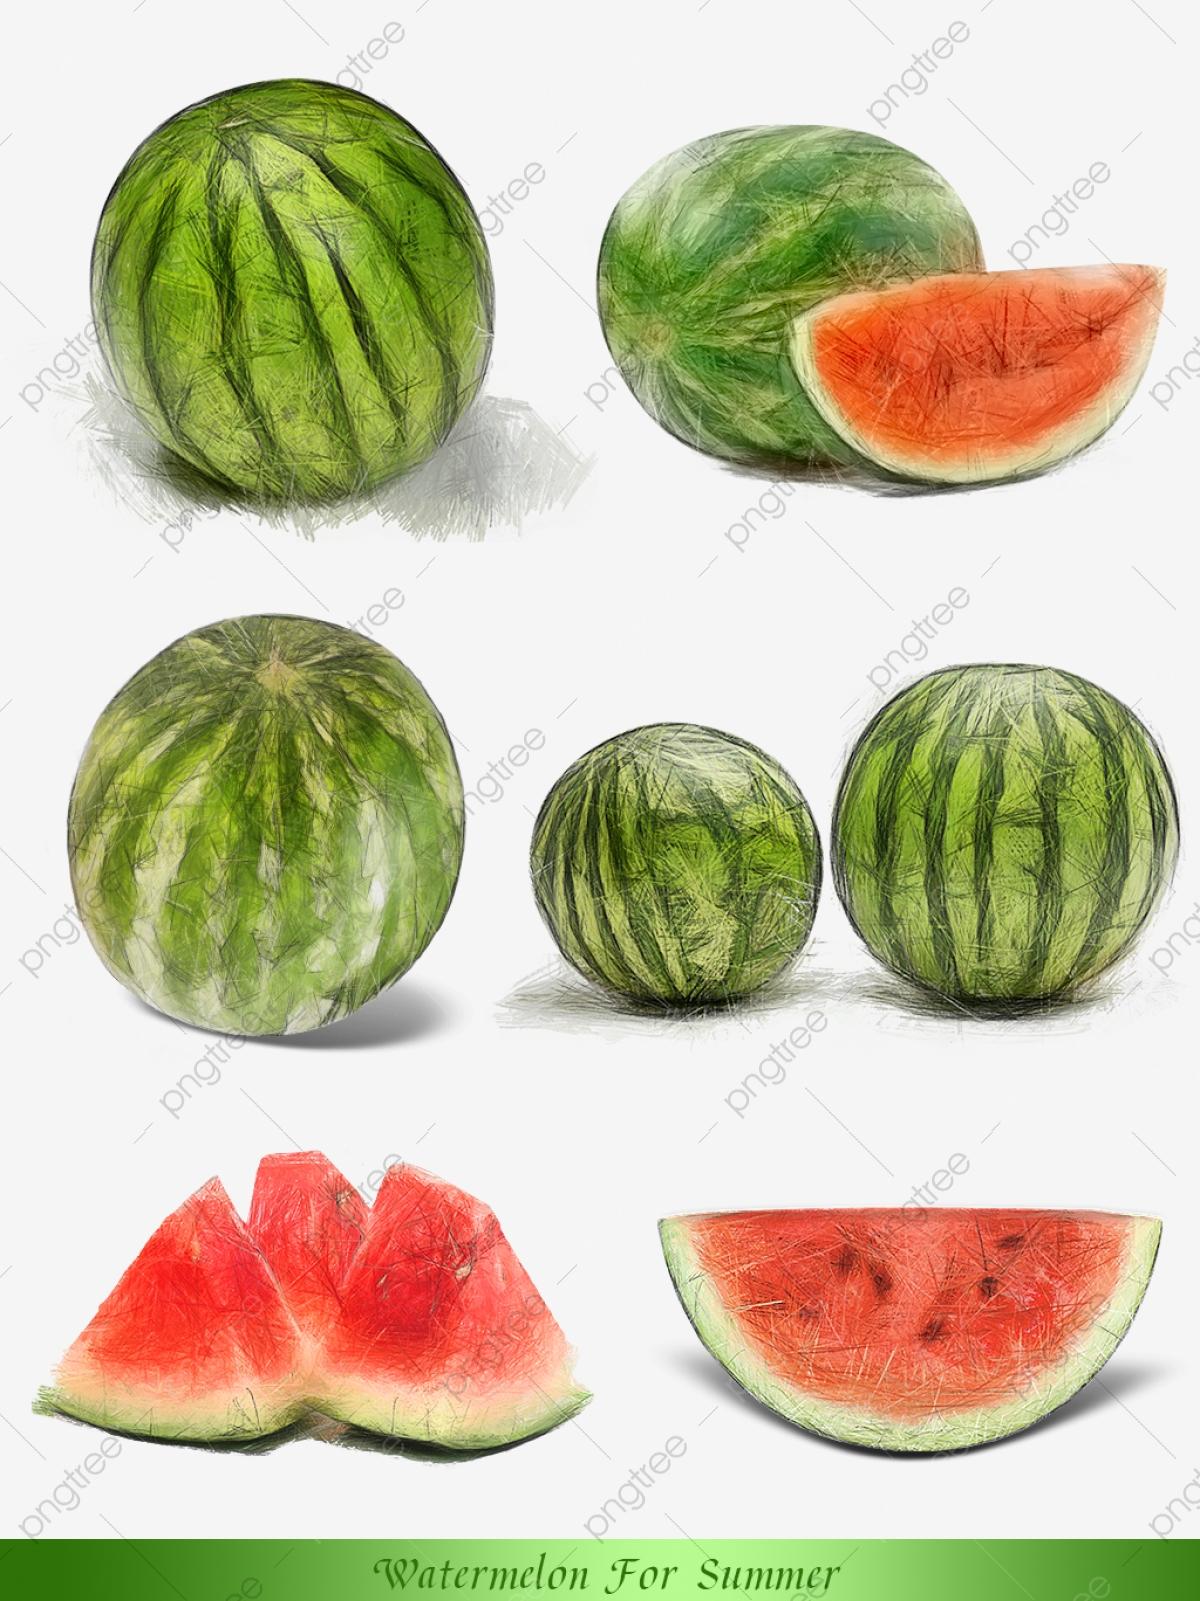 Watermelon clipart sihat. Enam elemen komersil tembikai